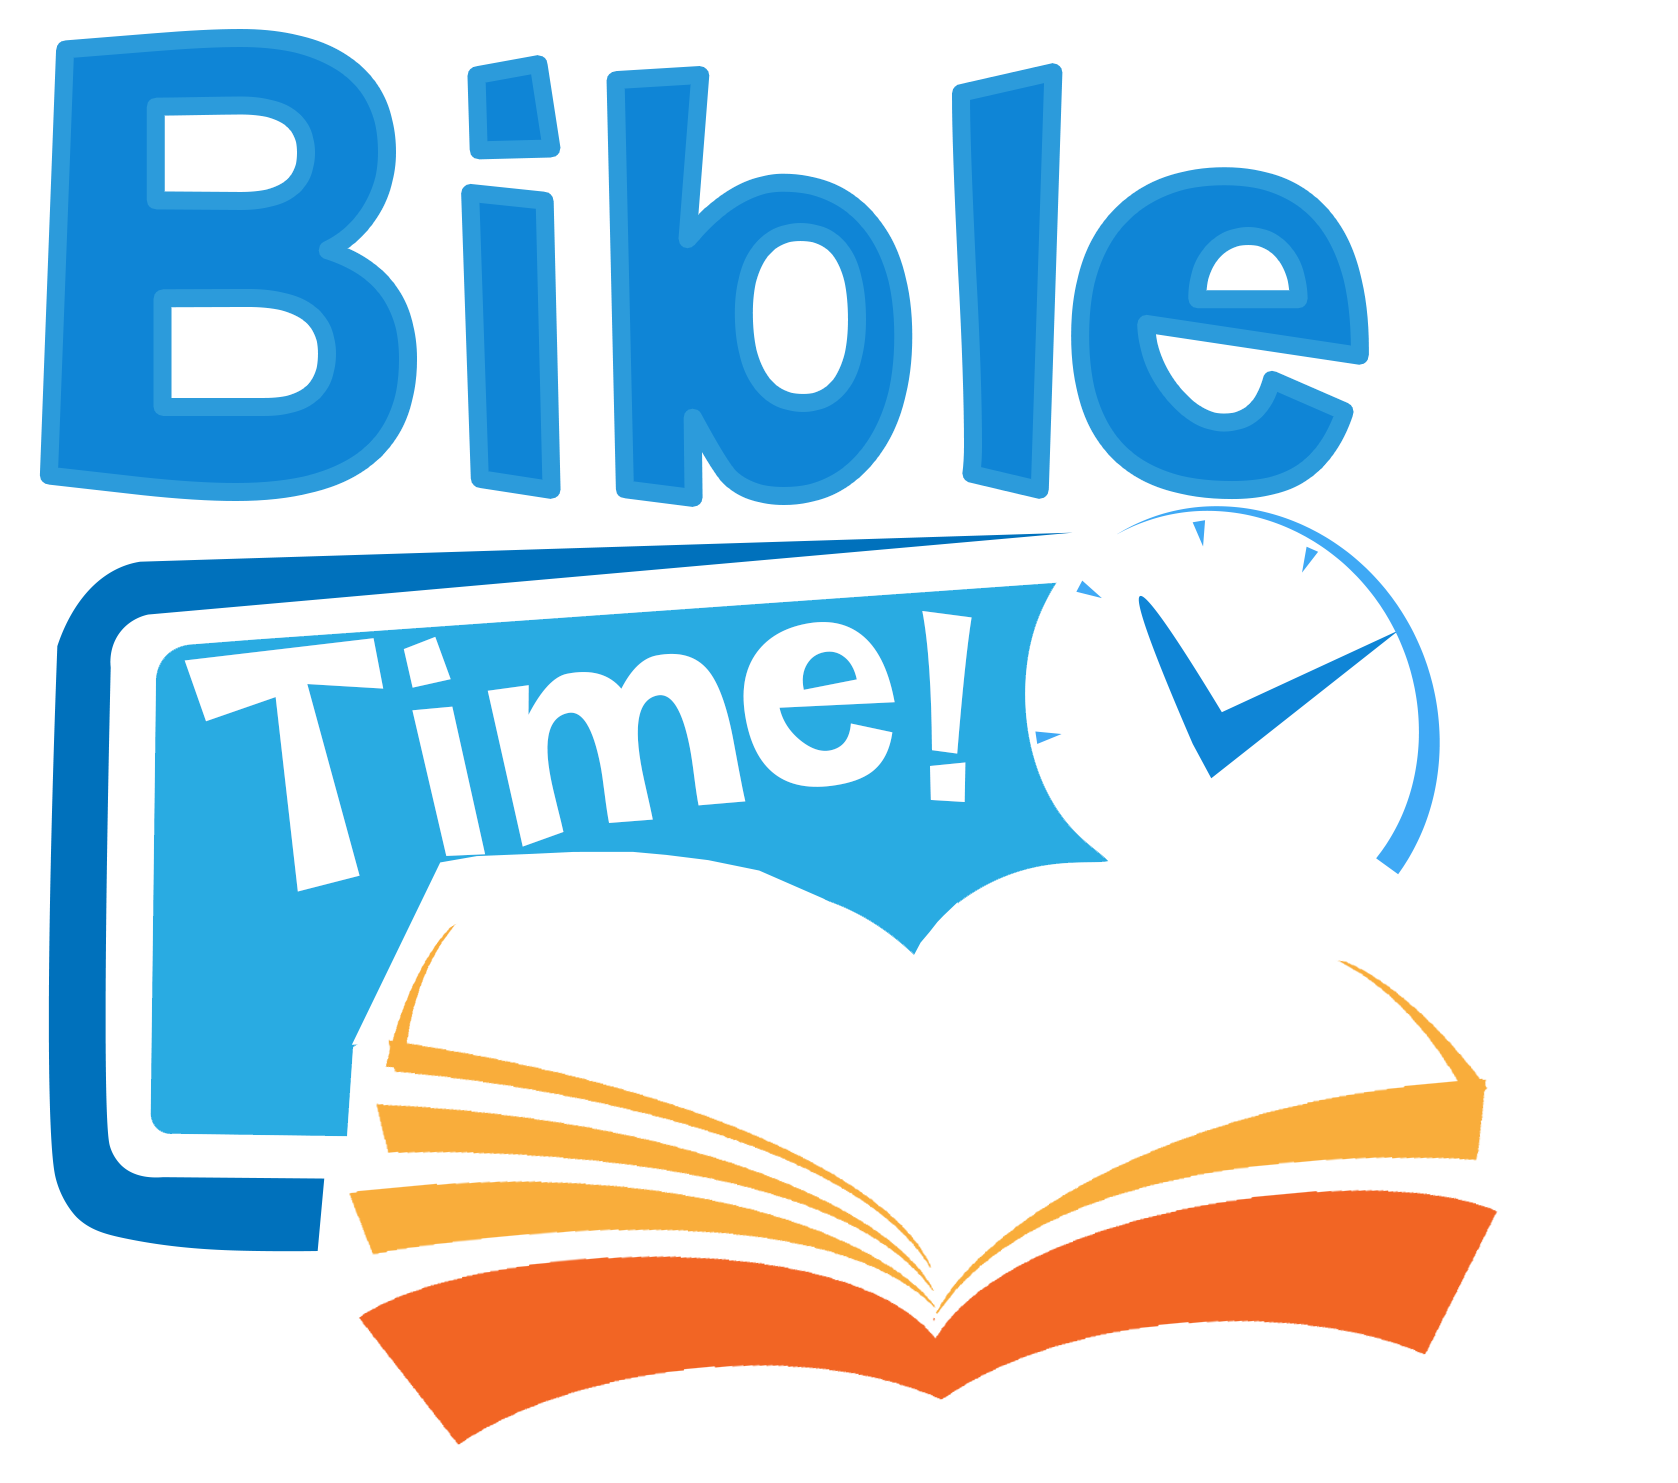 Childrens bible stories activities. Crafts clipart fun activity